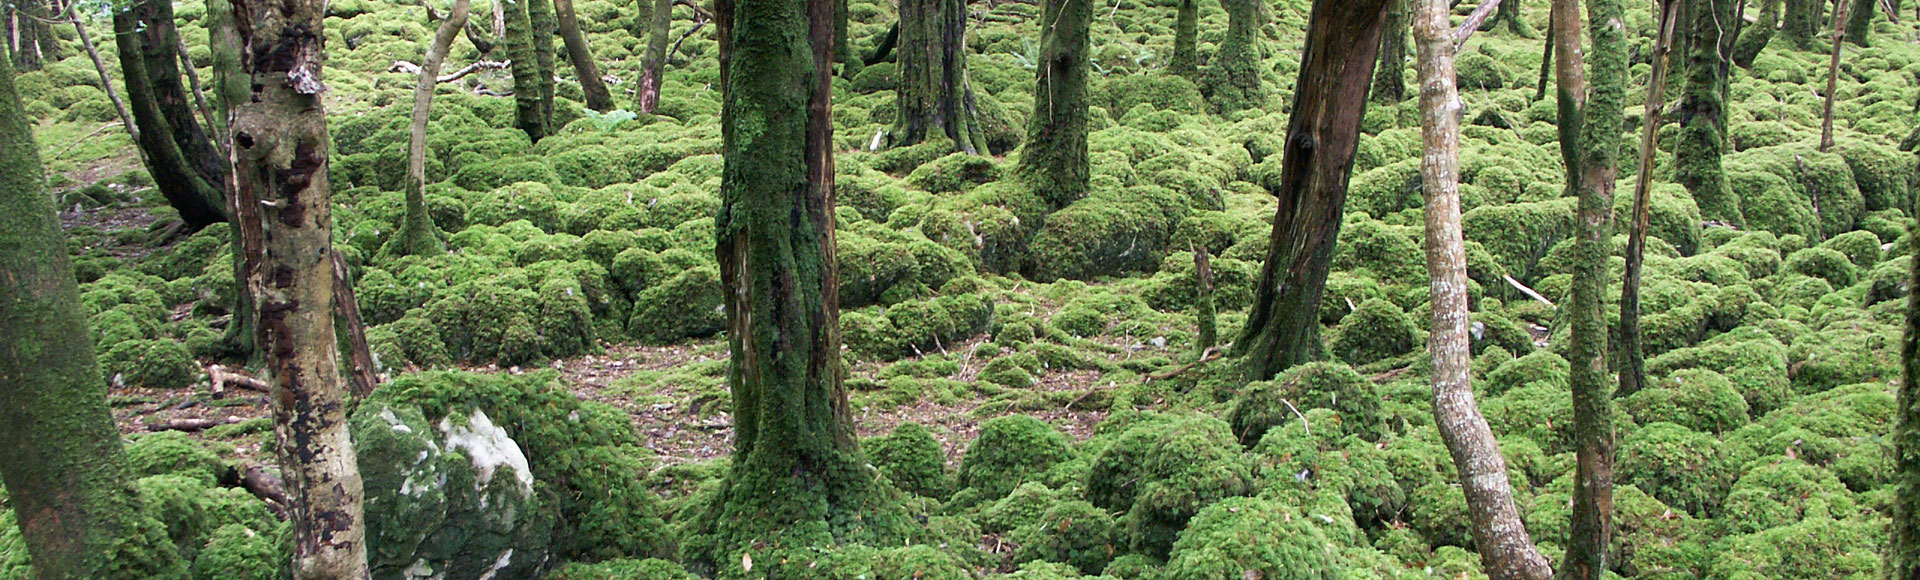 Wald 0725 415